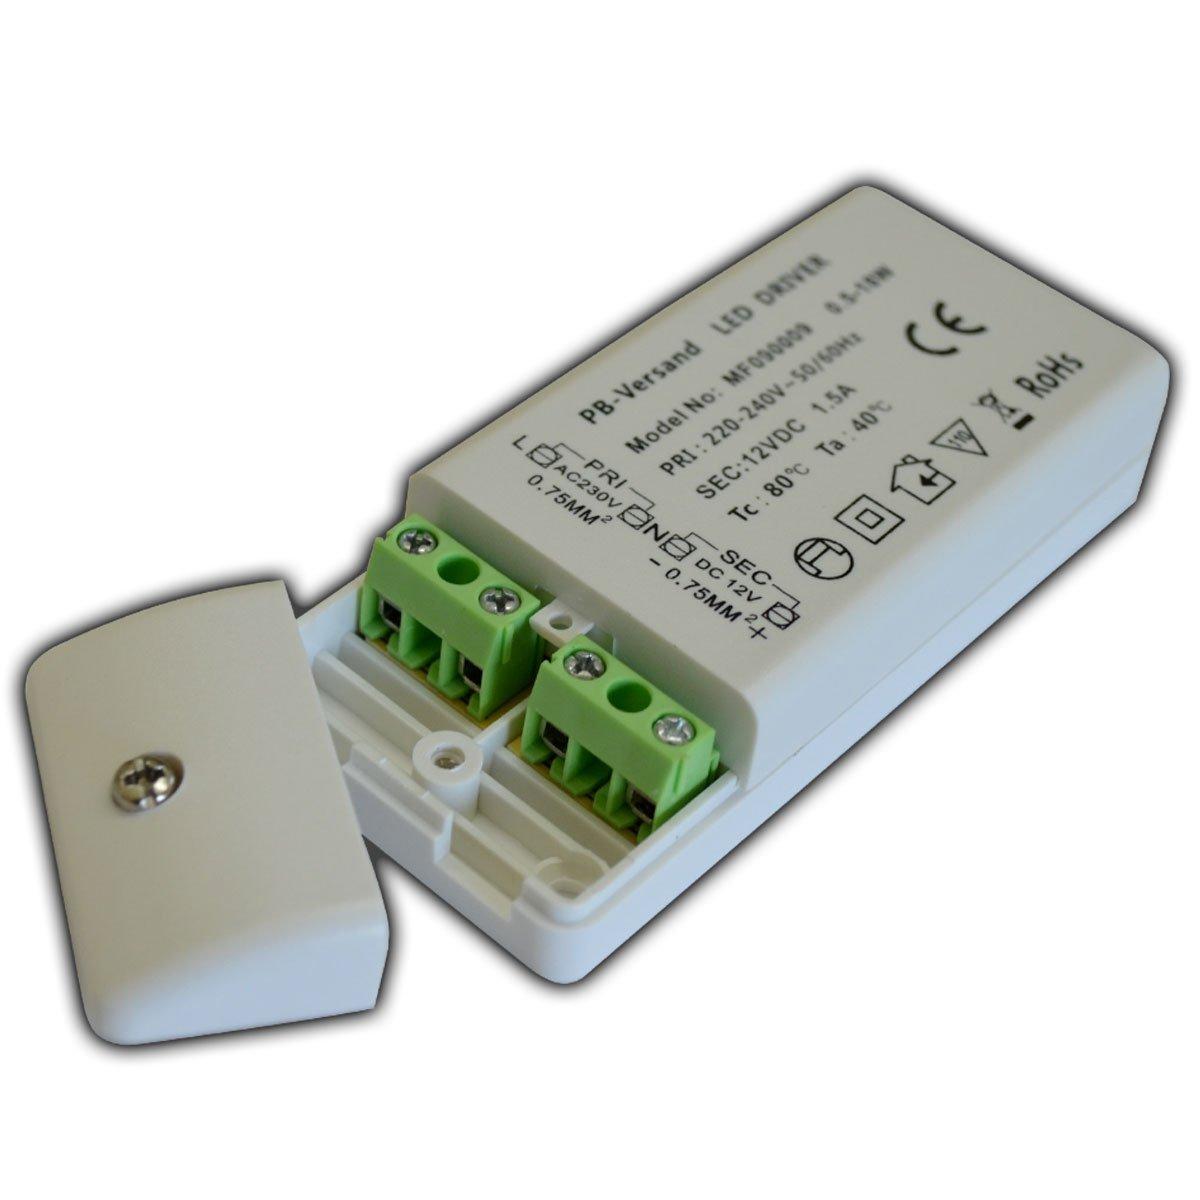 PB Versand - Trasformatore G4 DC per luce Led, da 12 V, 0, 5-18 Watt. 18.00 wattsW, 12.00 voltsV PB-Versand®